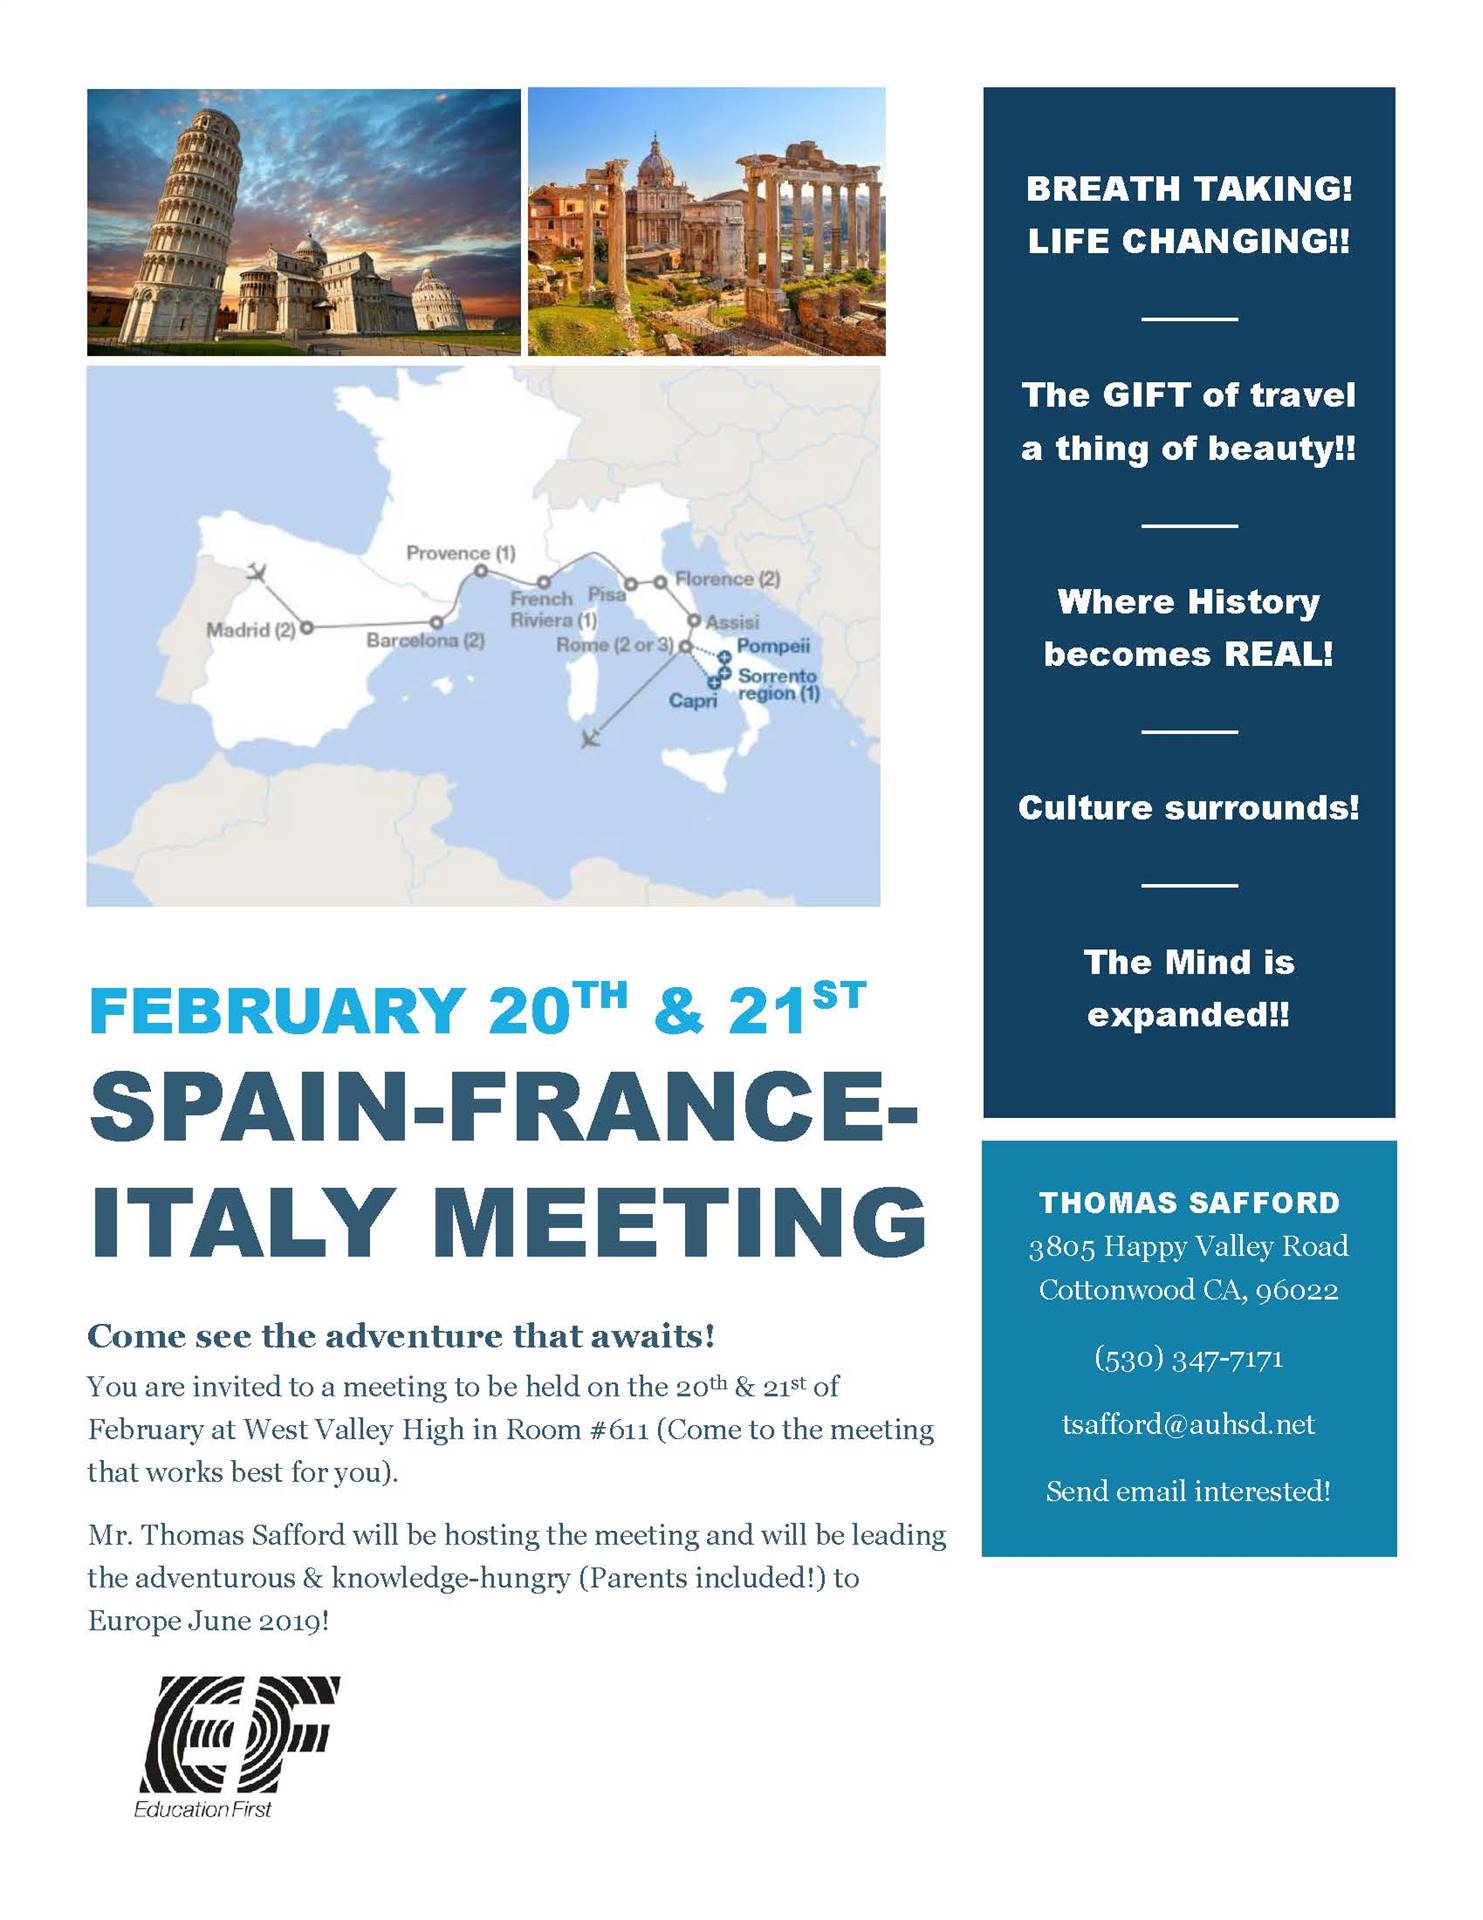 Spain/Italy/France Meeting, February 20-21